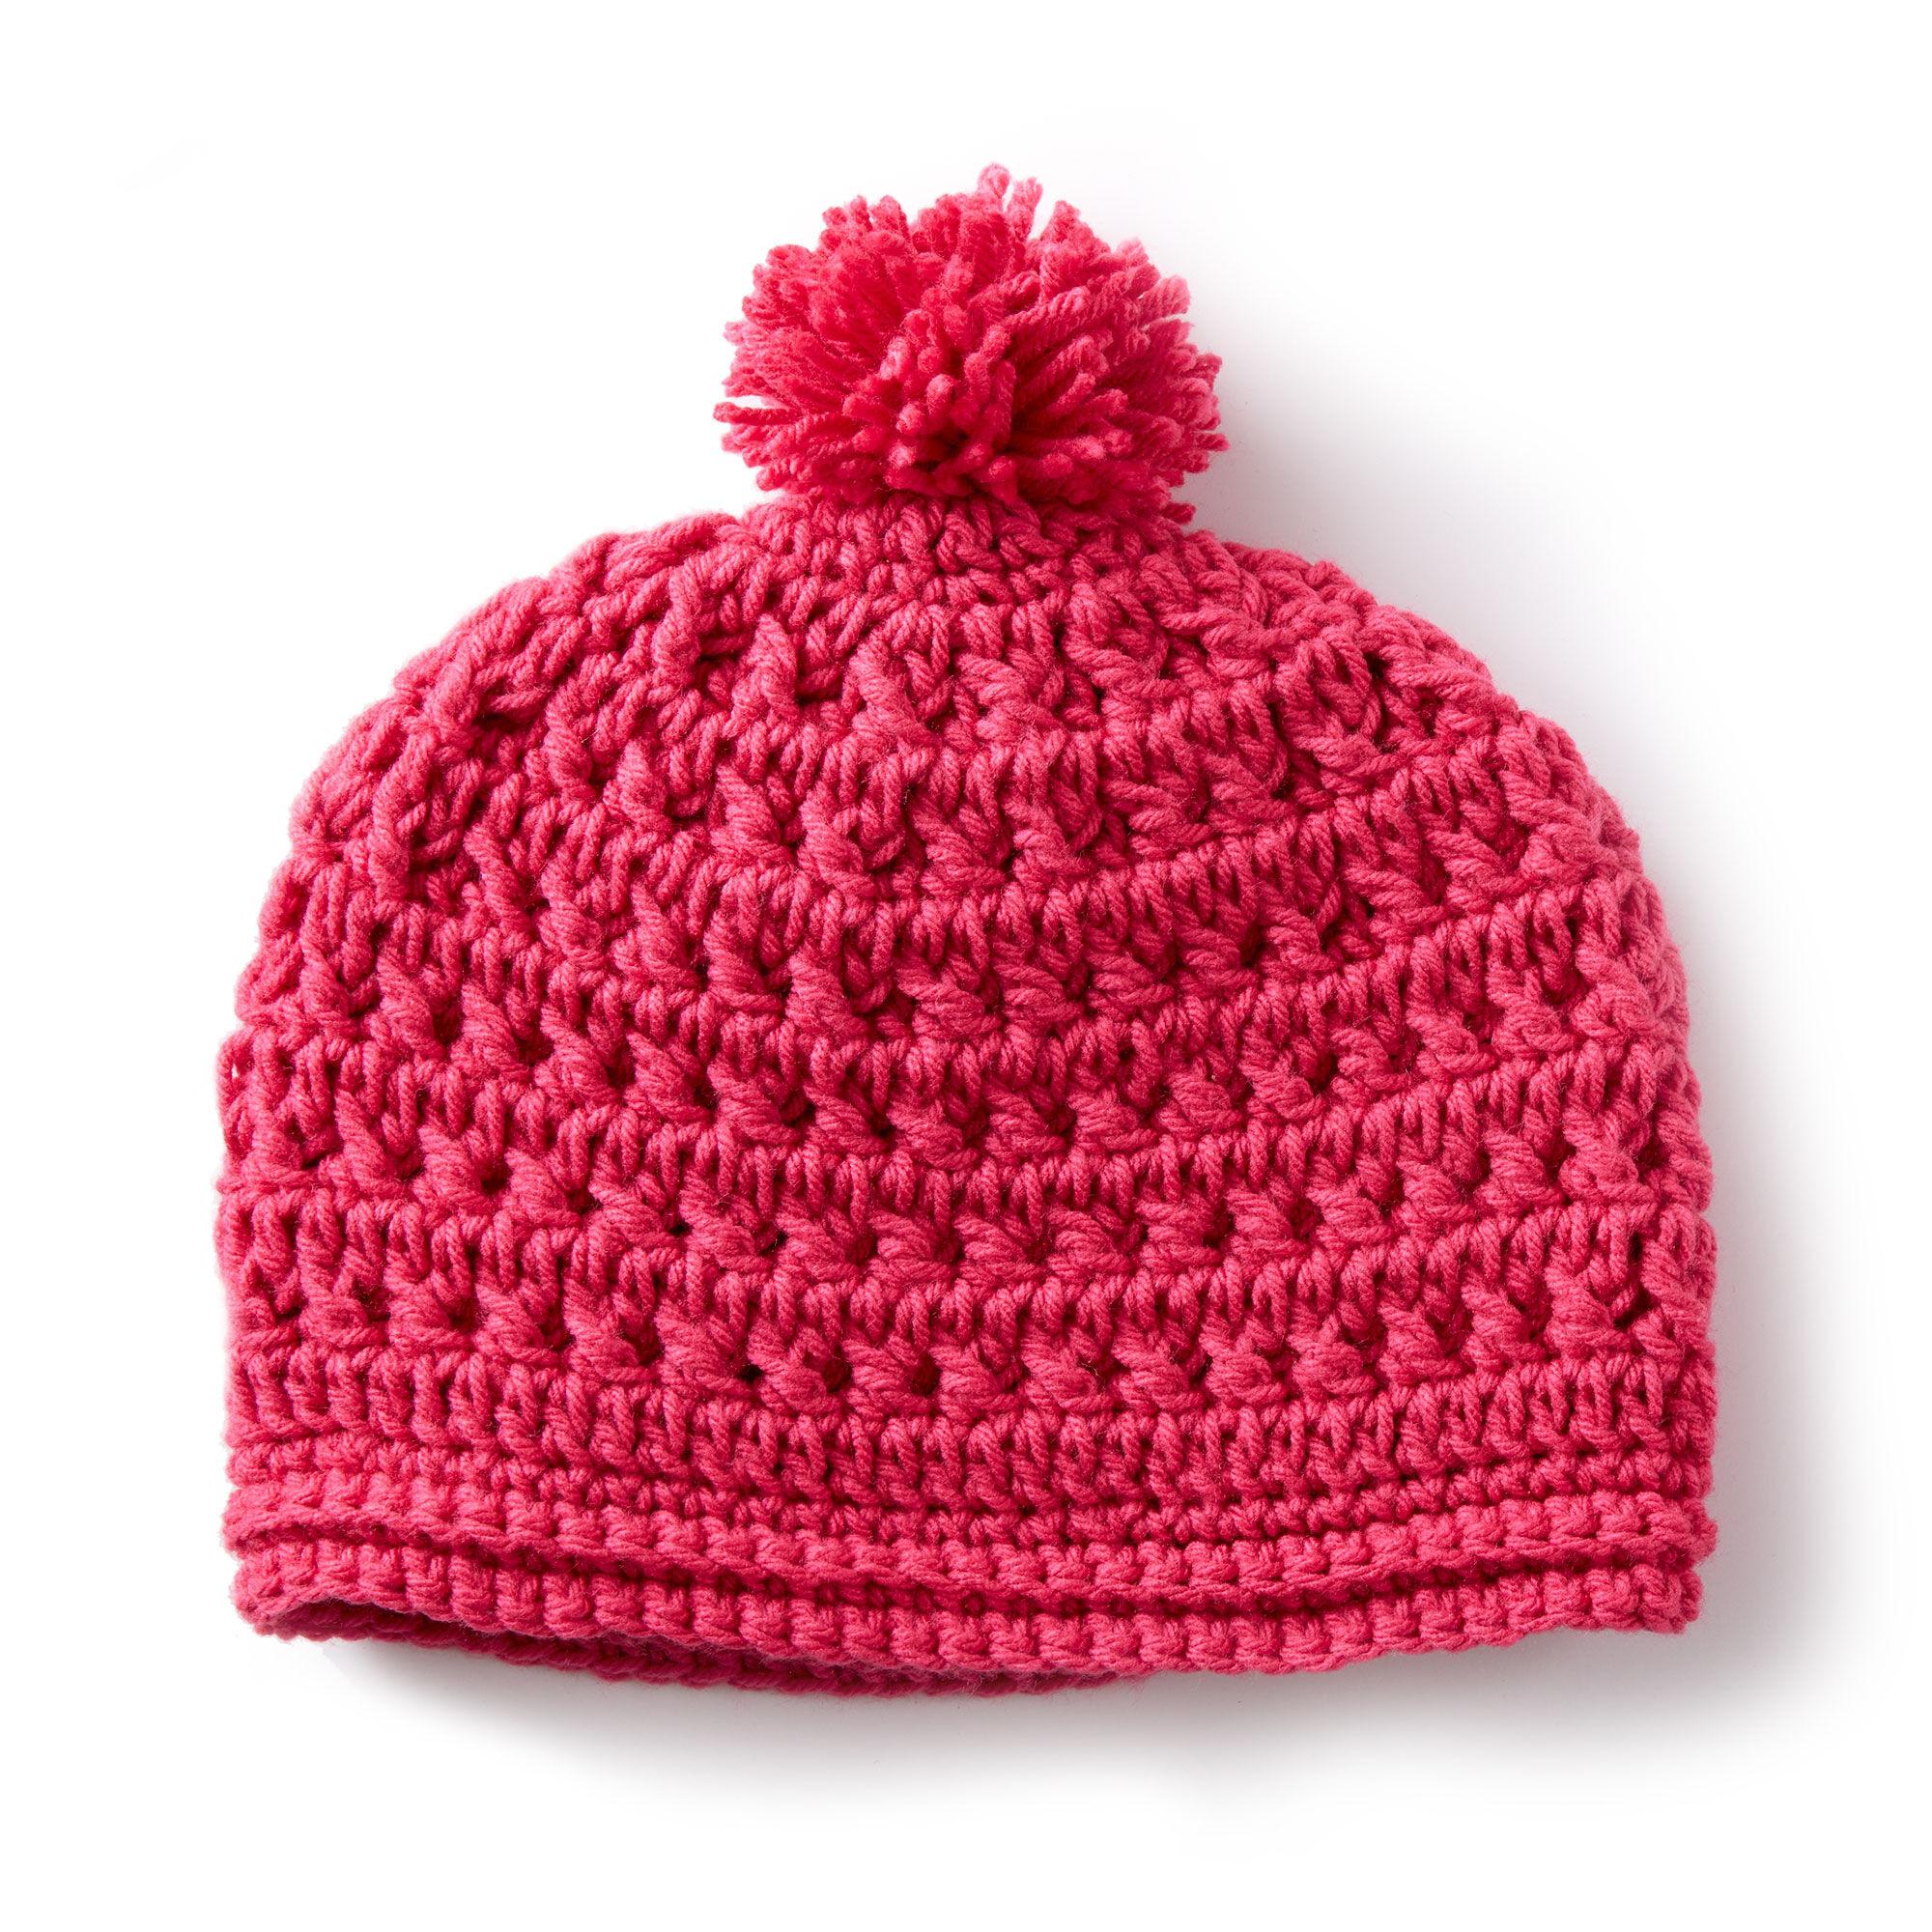 Caron Pebbled Texture Crochet Hat Yarnspirations